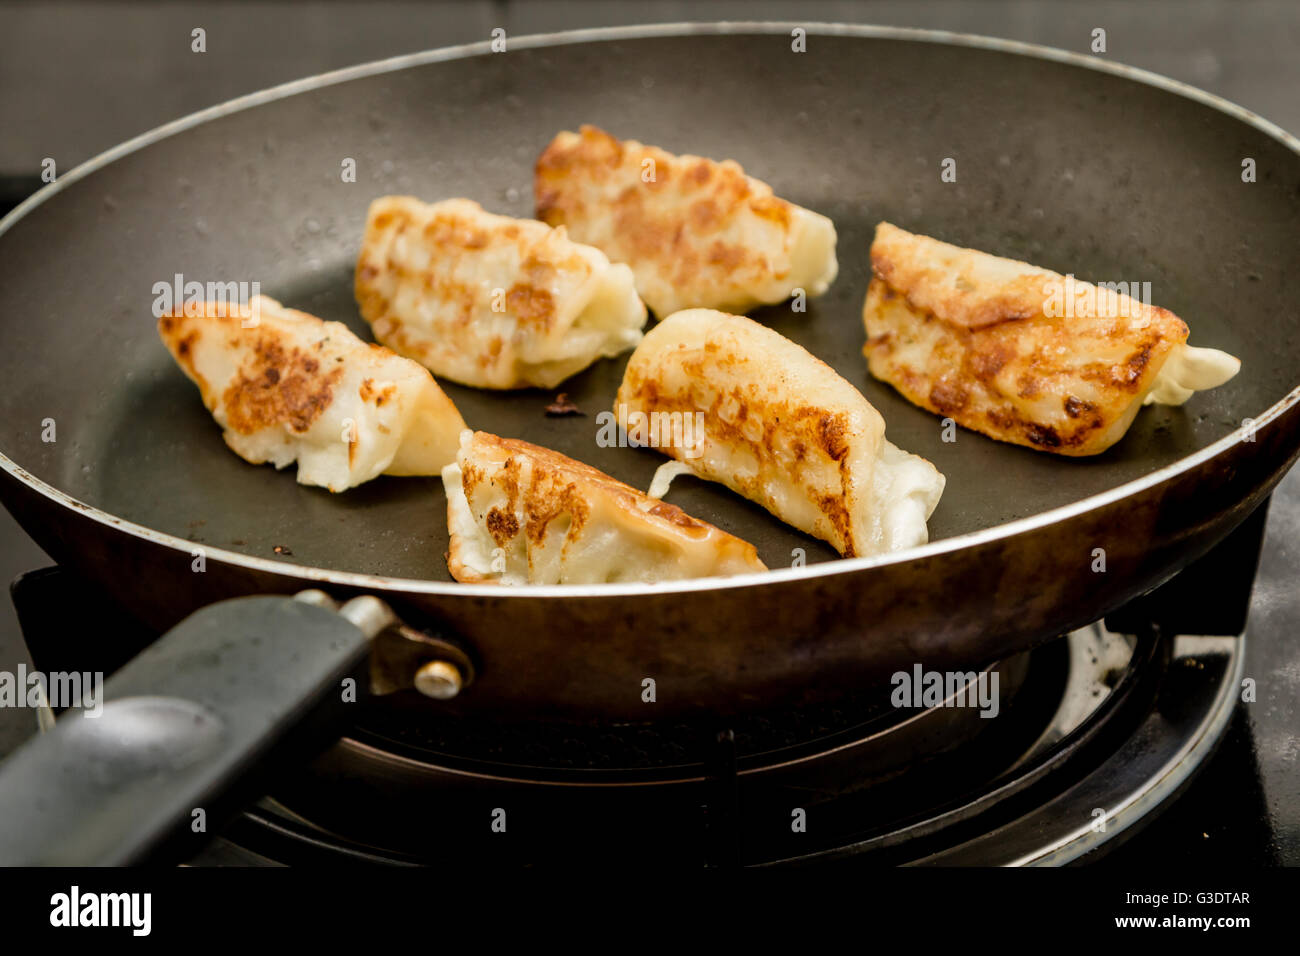 gyoza japanese dumplings in frying pan stock photo 105410671 alamy